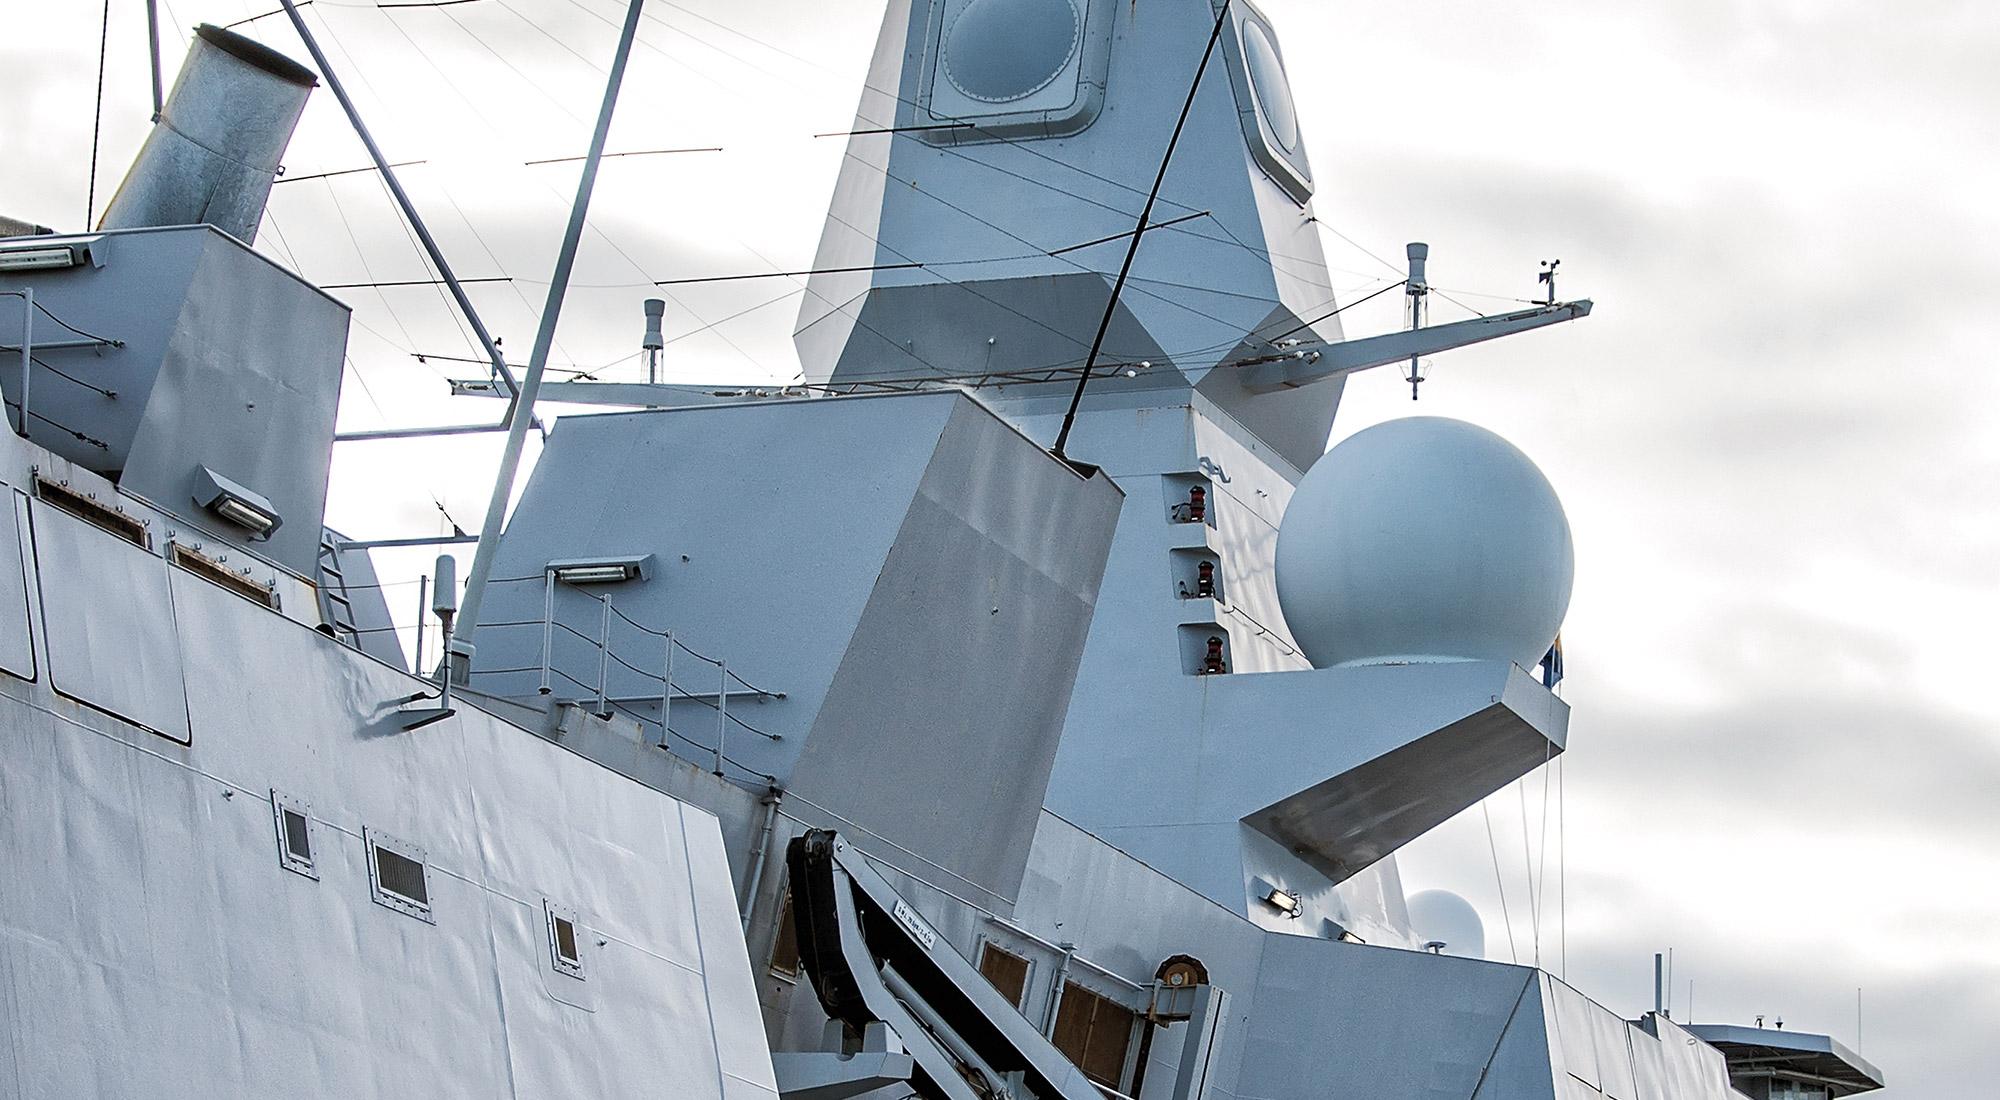 3sdl image of battle ship and radar technology